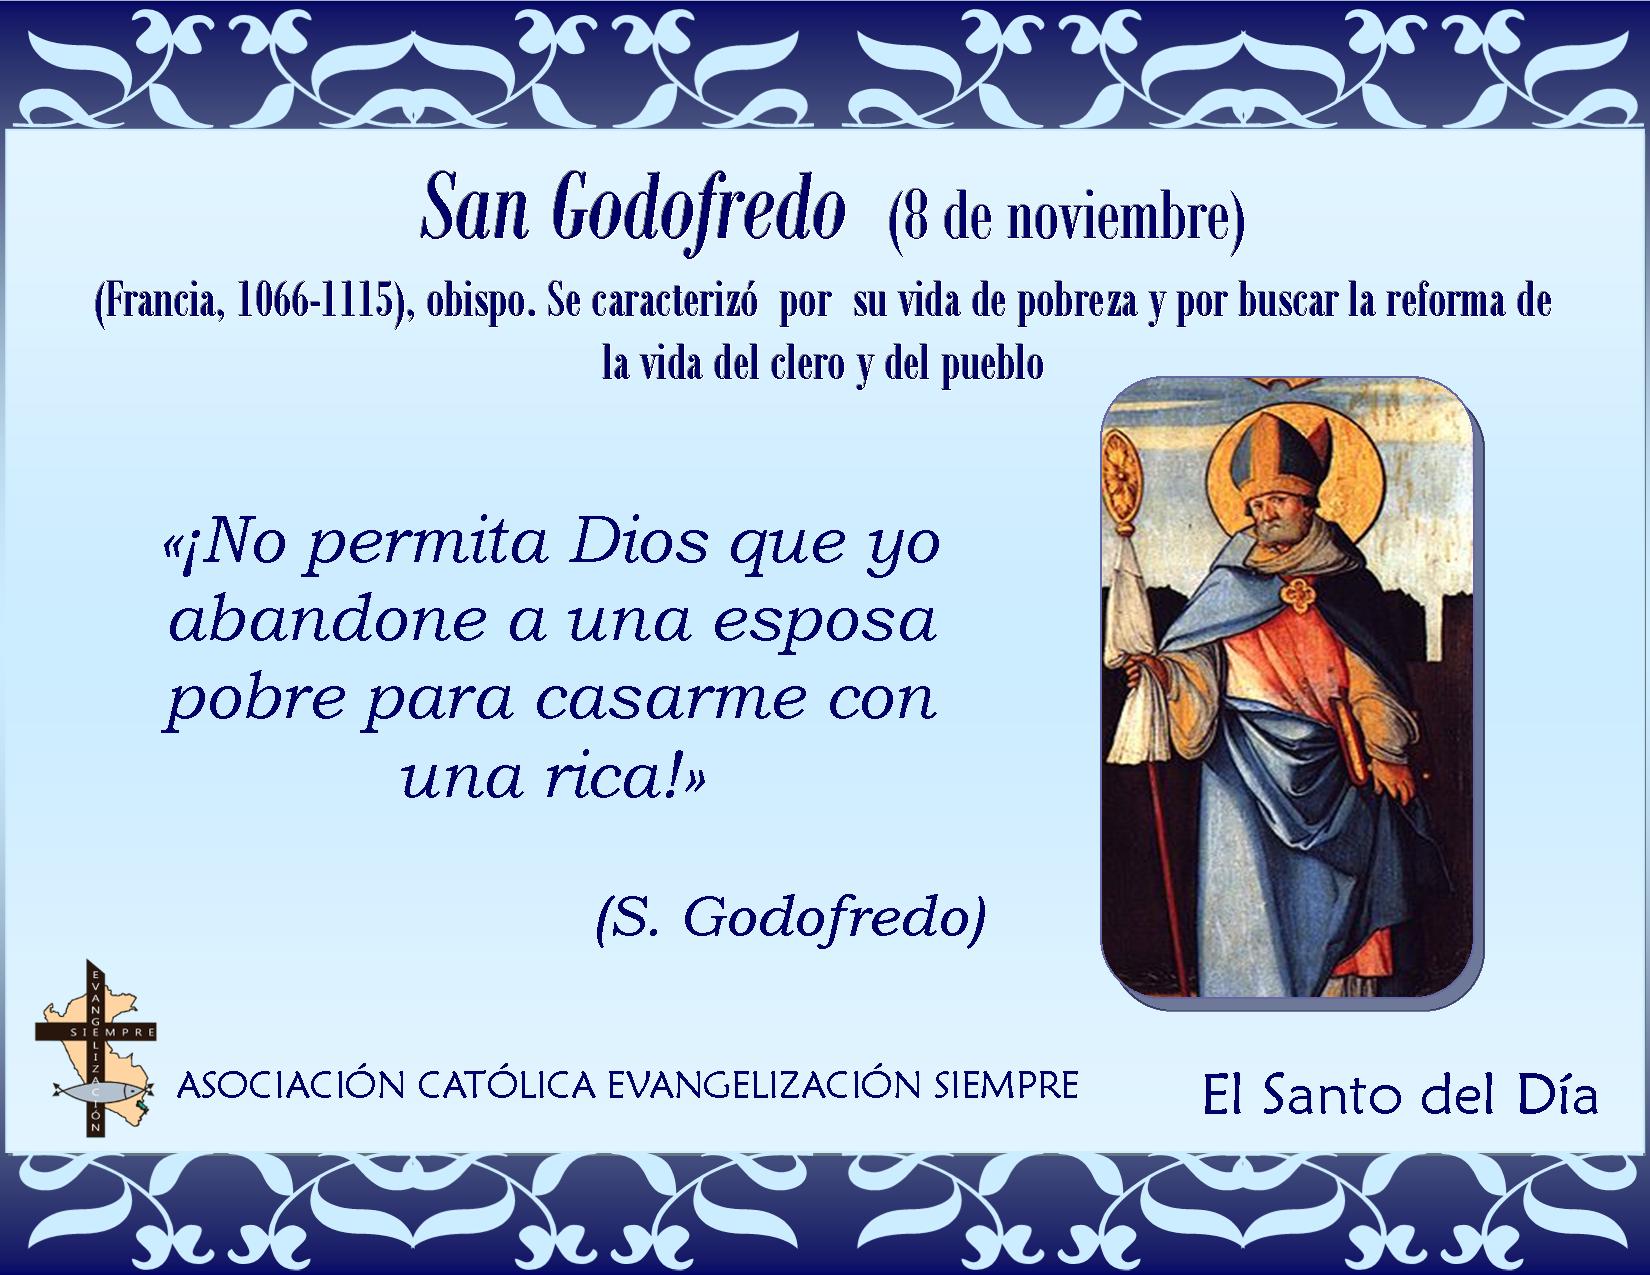 santo-del-dia-8-noviembre